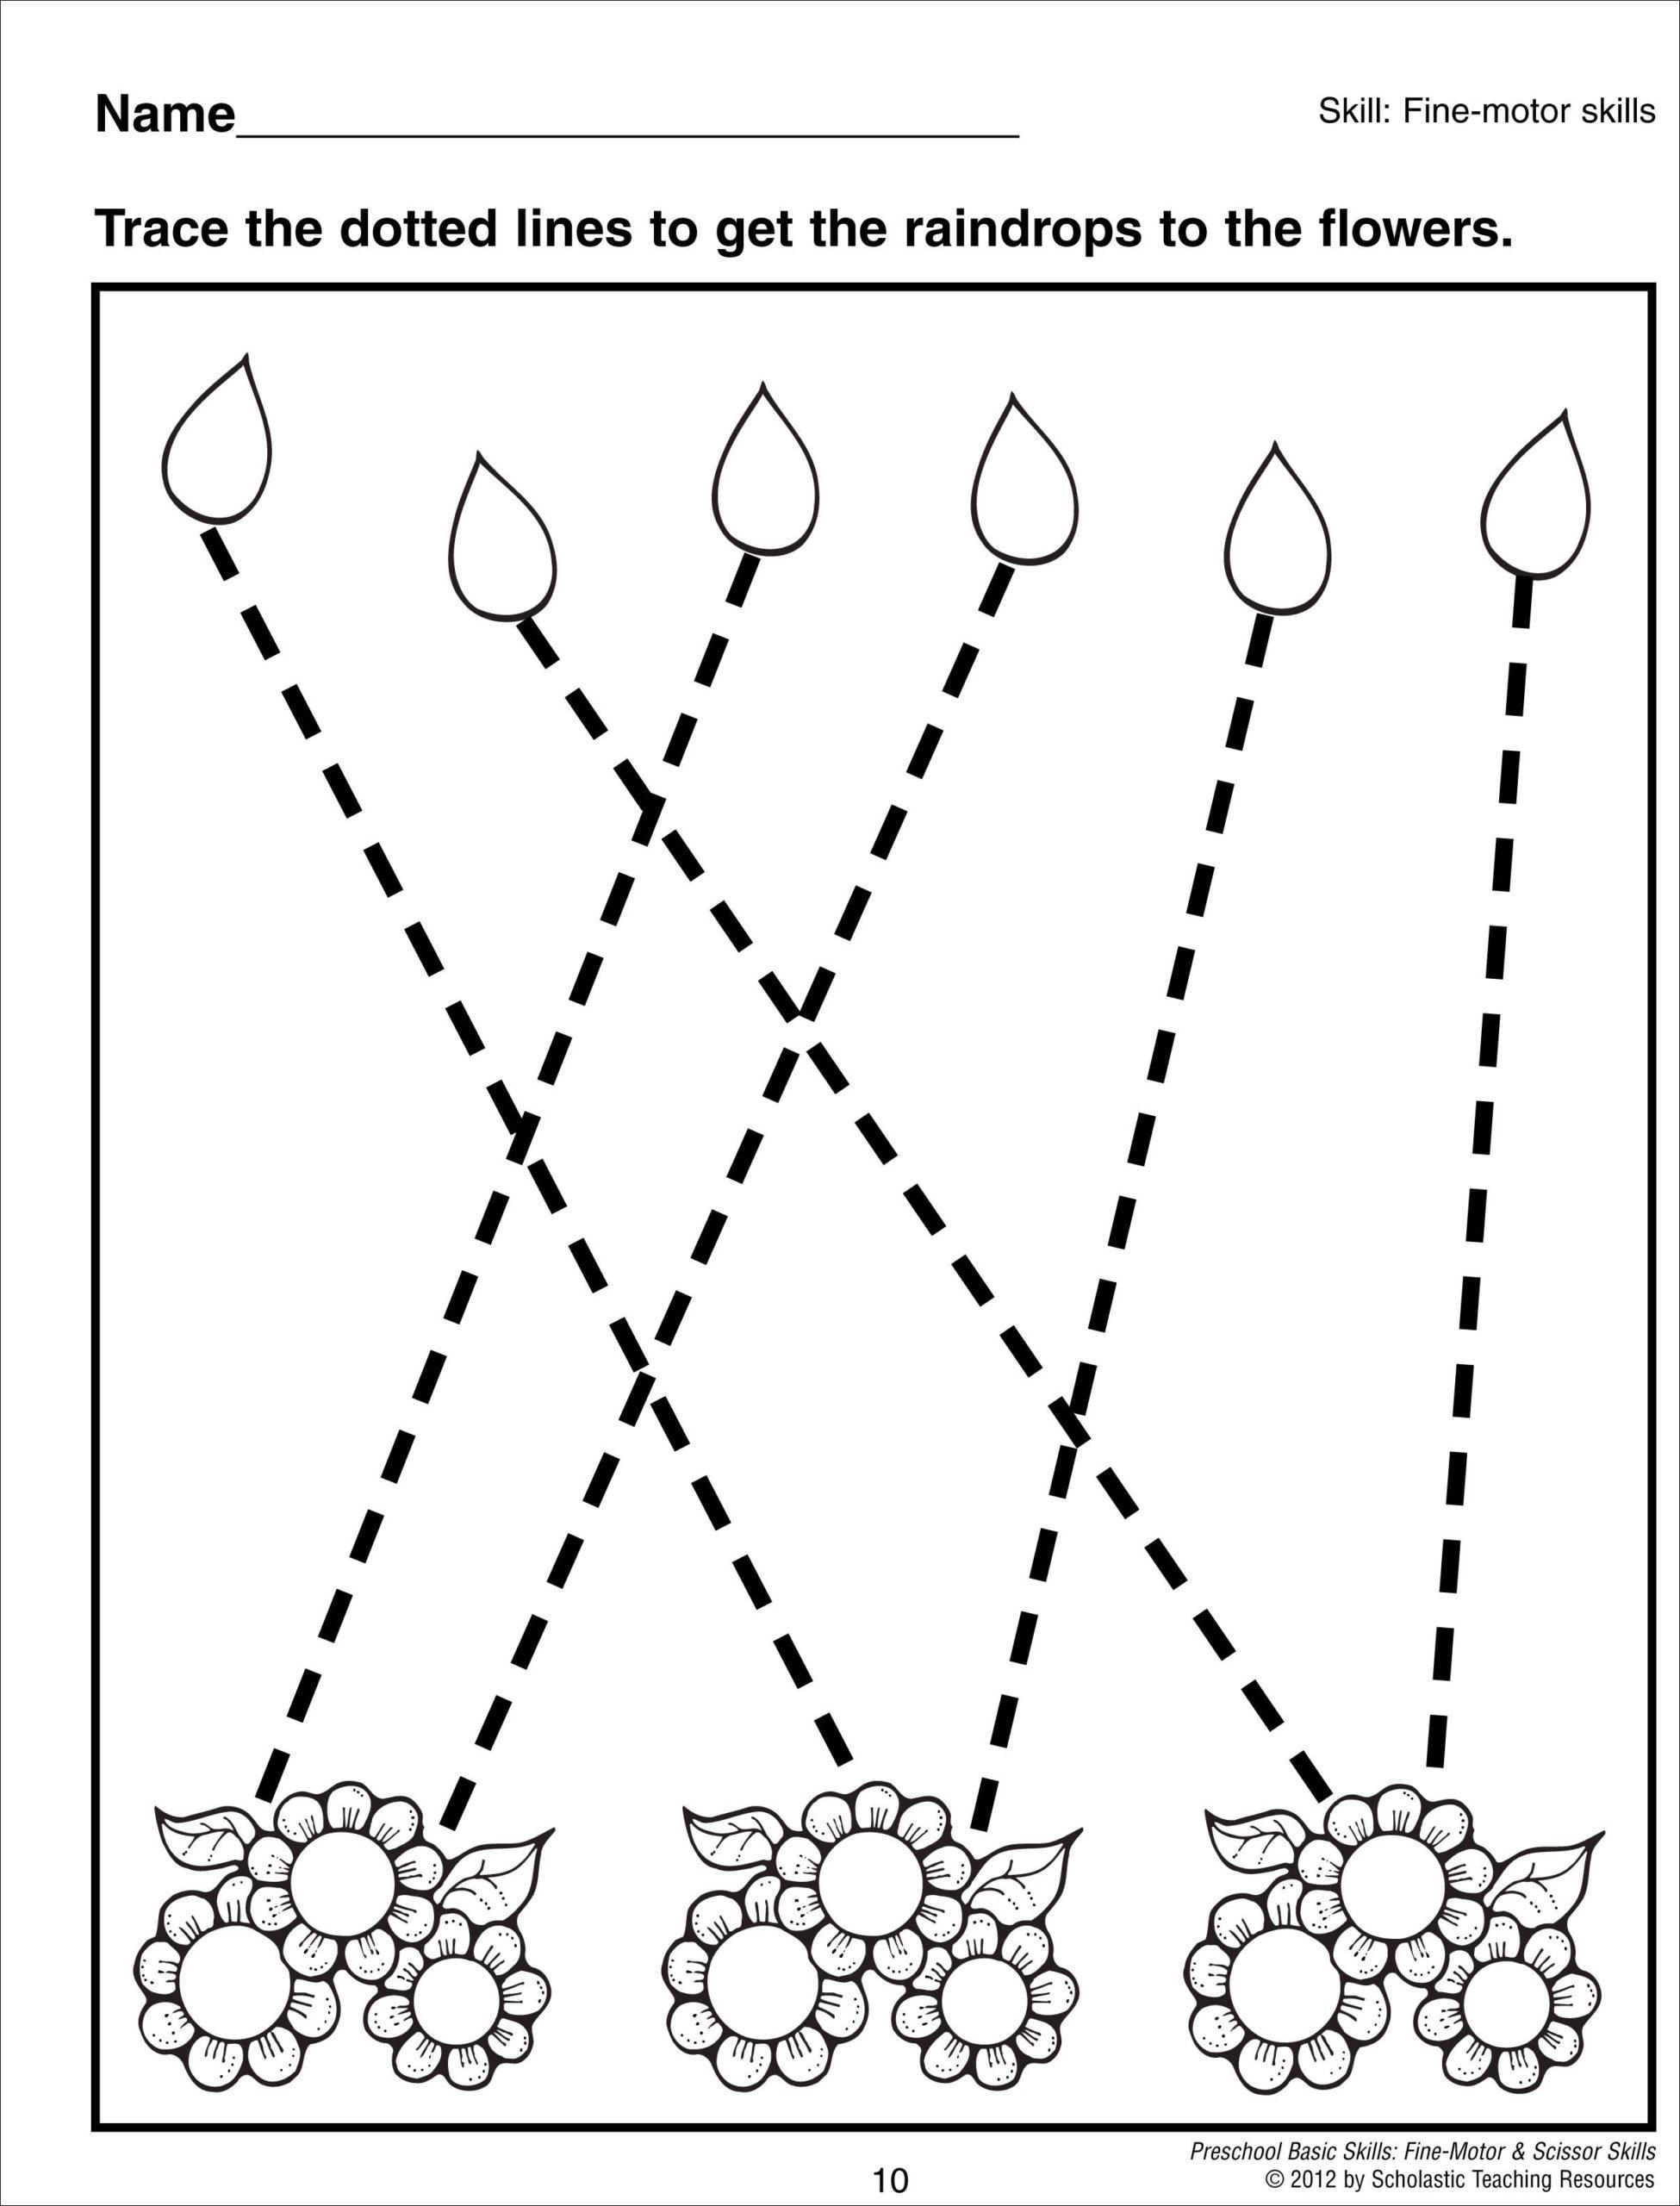 Worksheet ~ Worksheets For Preschoolers Free Printable pertaining to Name Tracing Jack